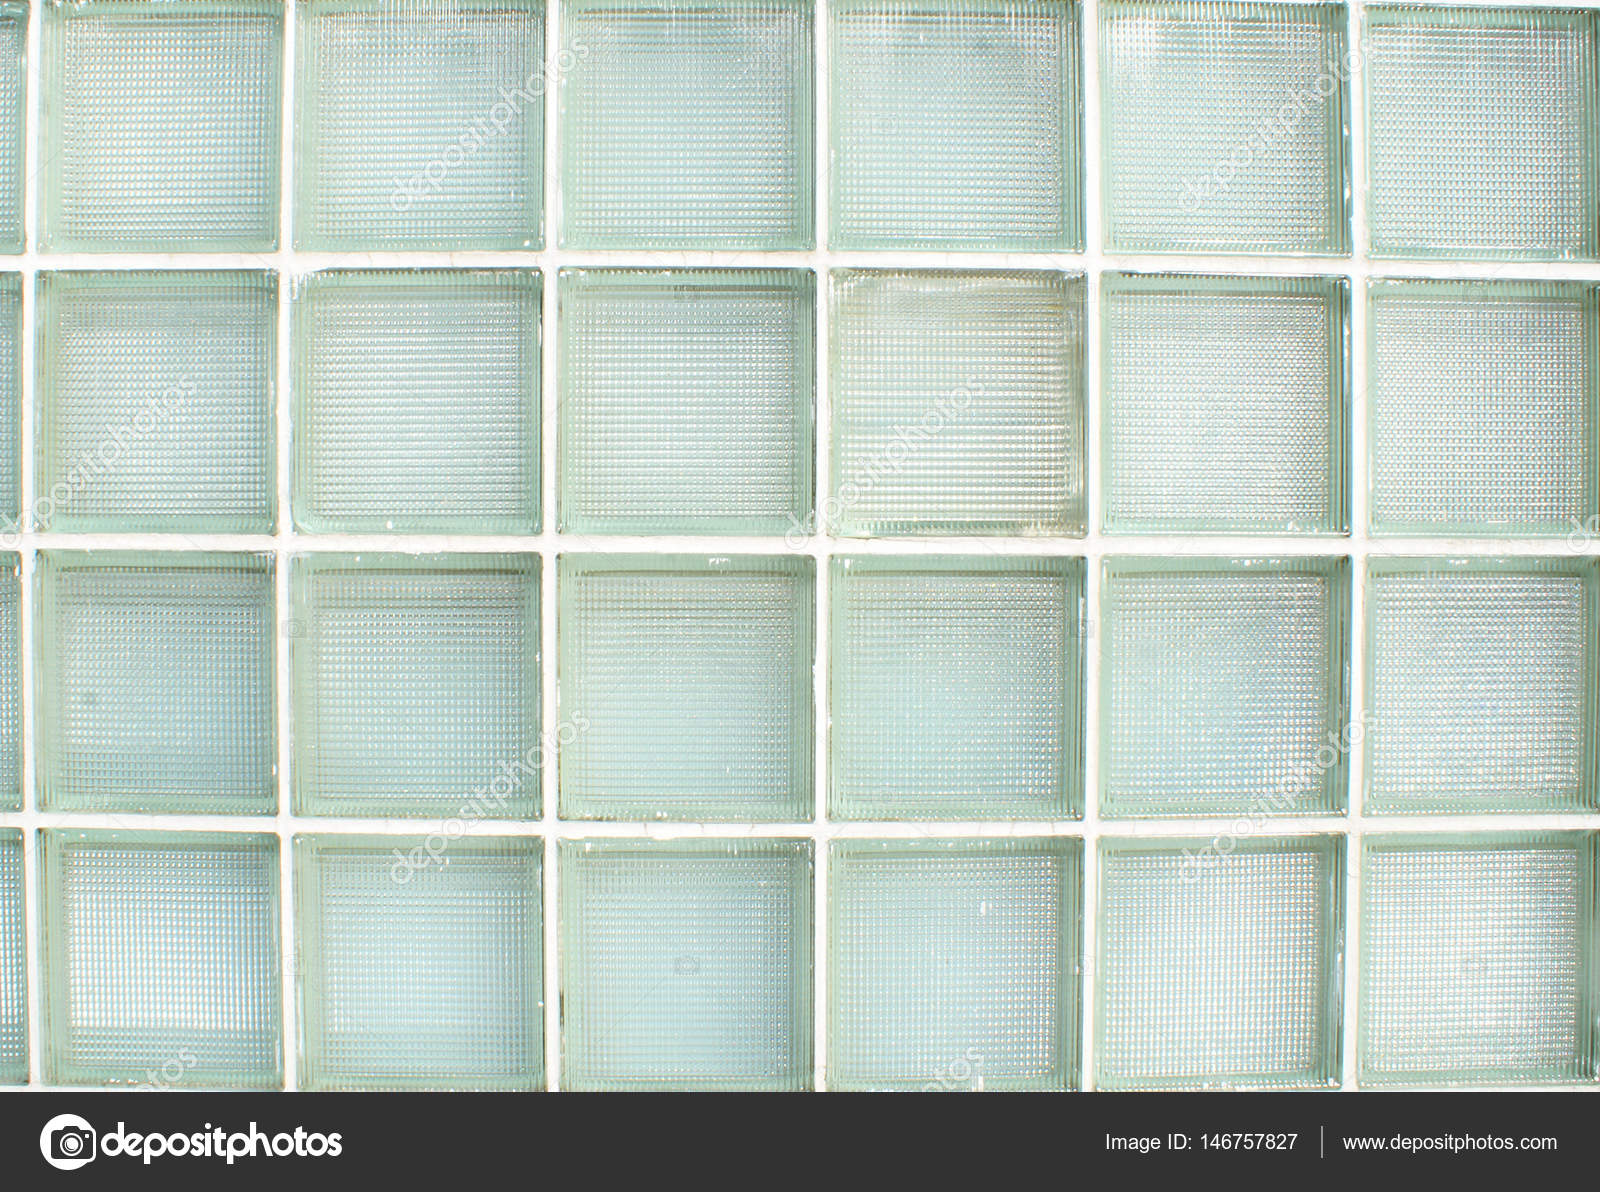 Esterno parete in vetro piastrelle u foto stock alphababy